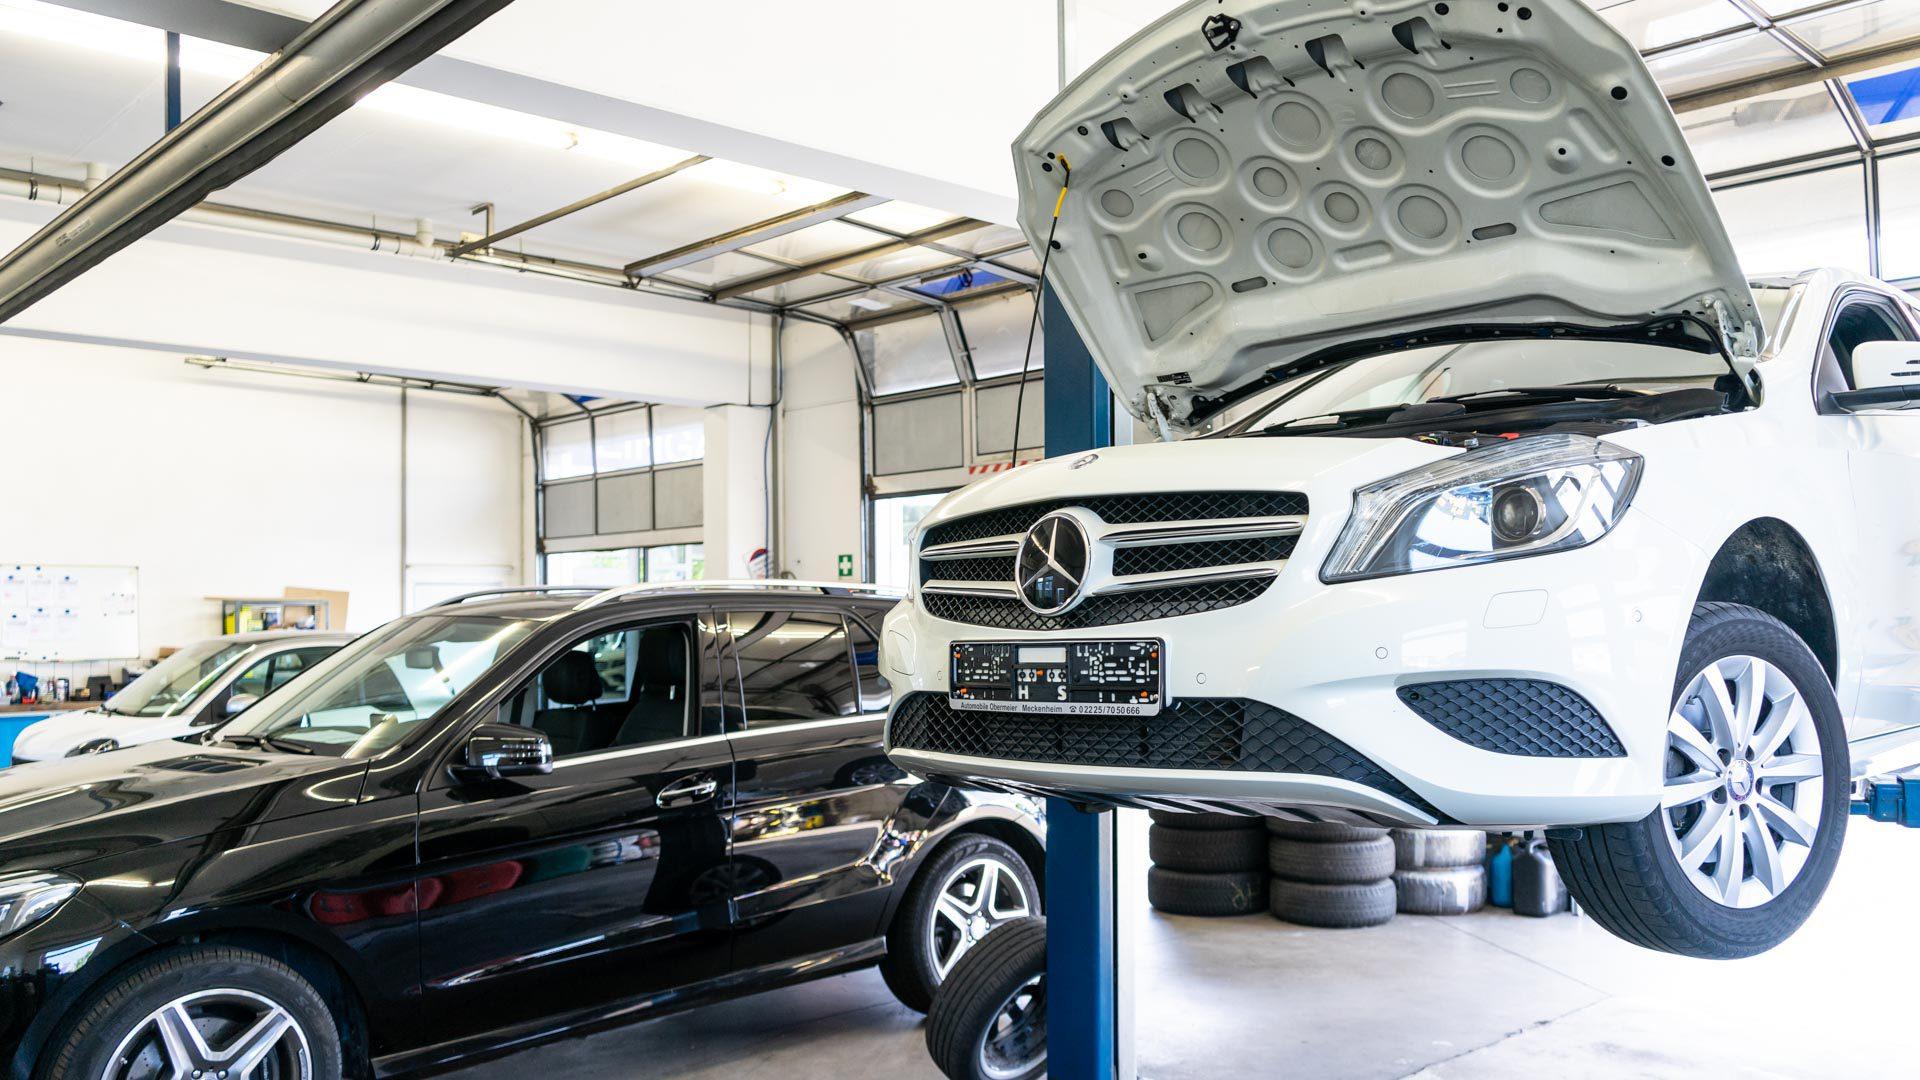 Aufgebockter Mercedes Benz in Werkstatt Obermeier